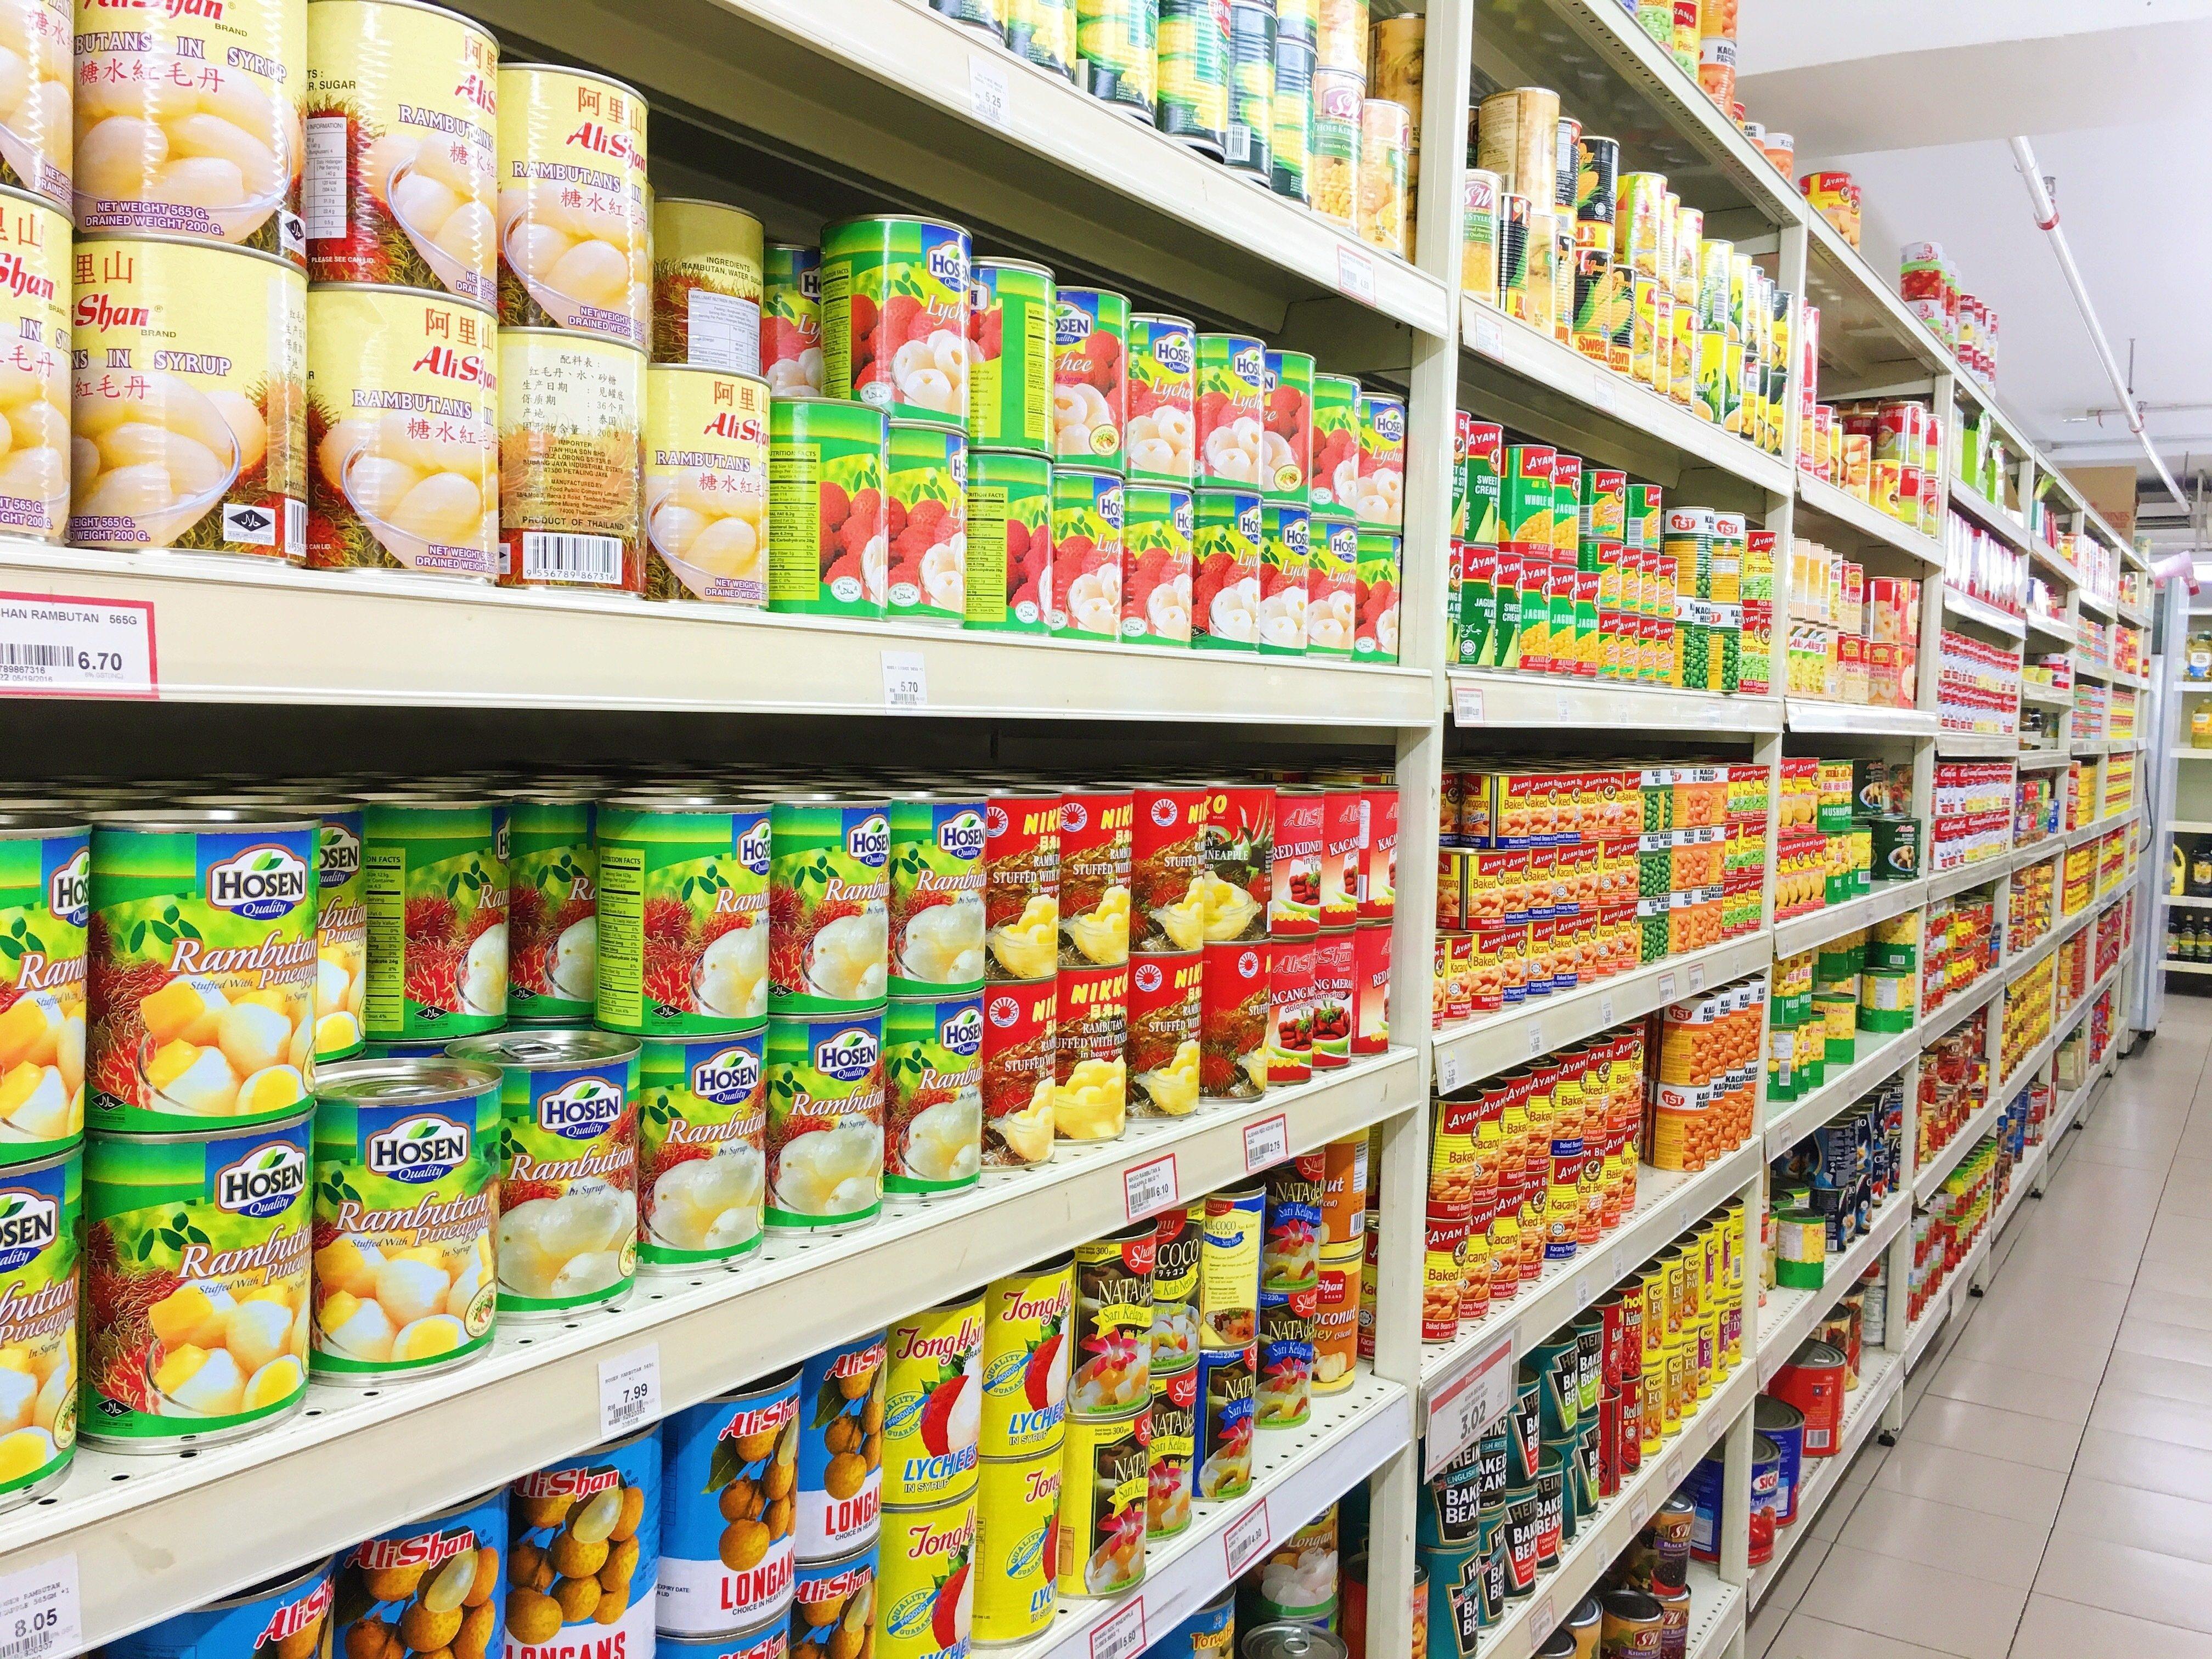 Pasillo de supermercado. Foto: Shutterstock